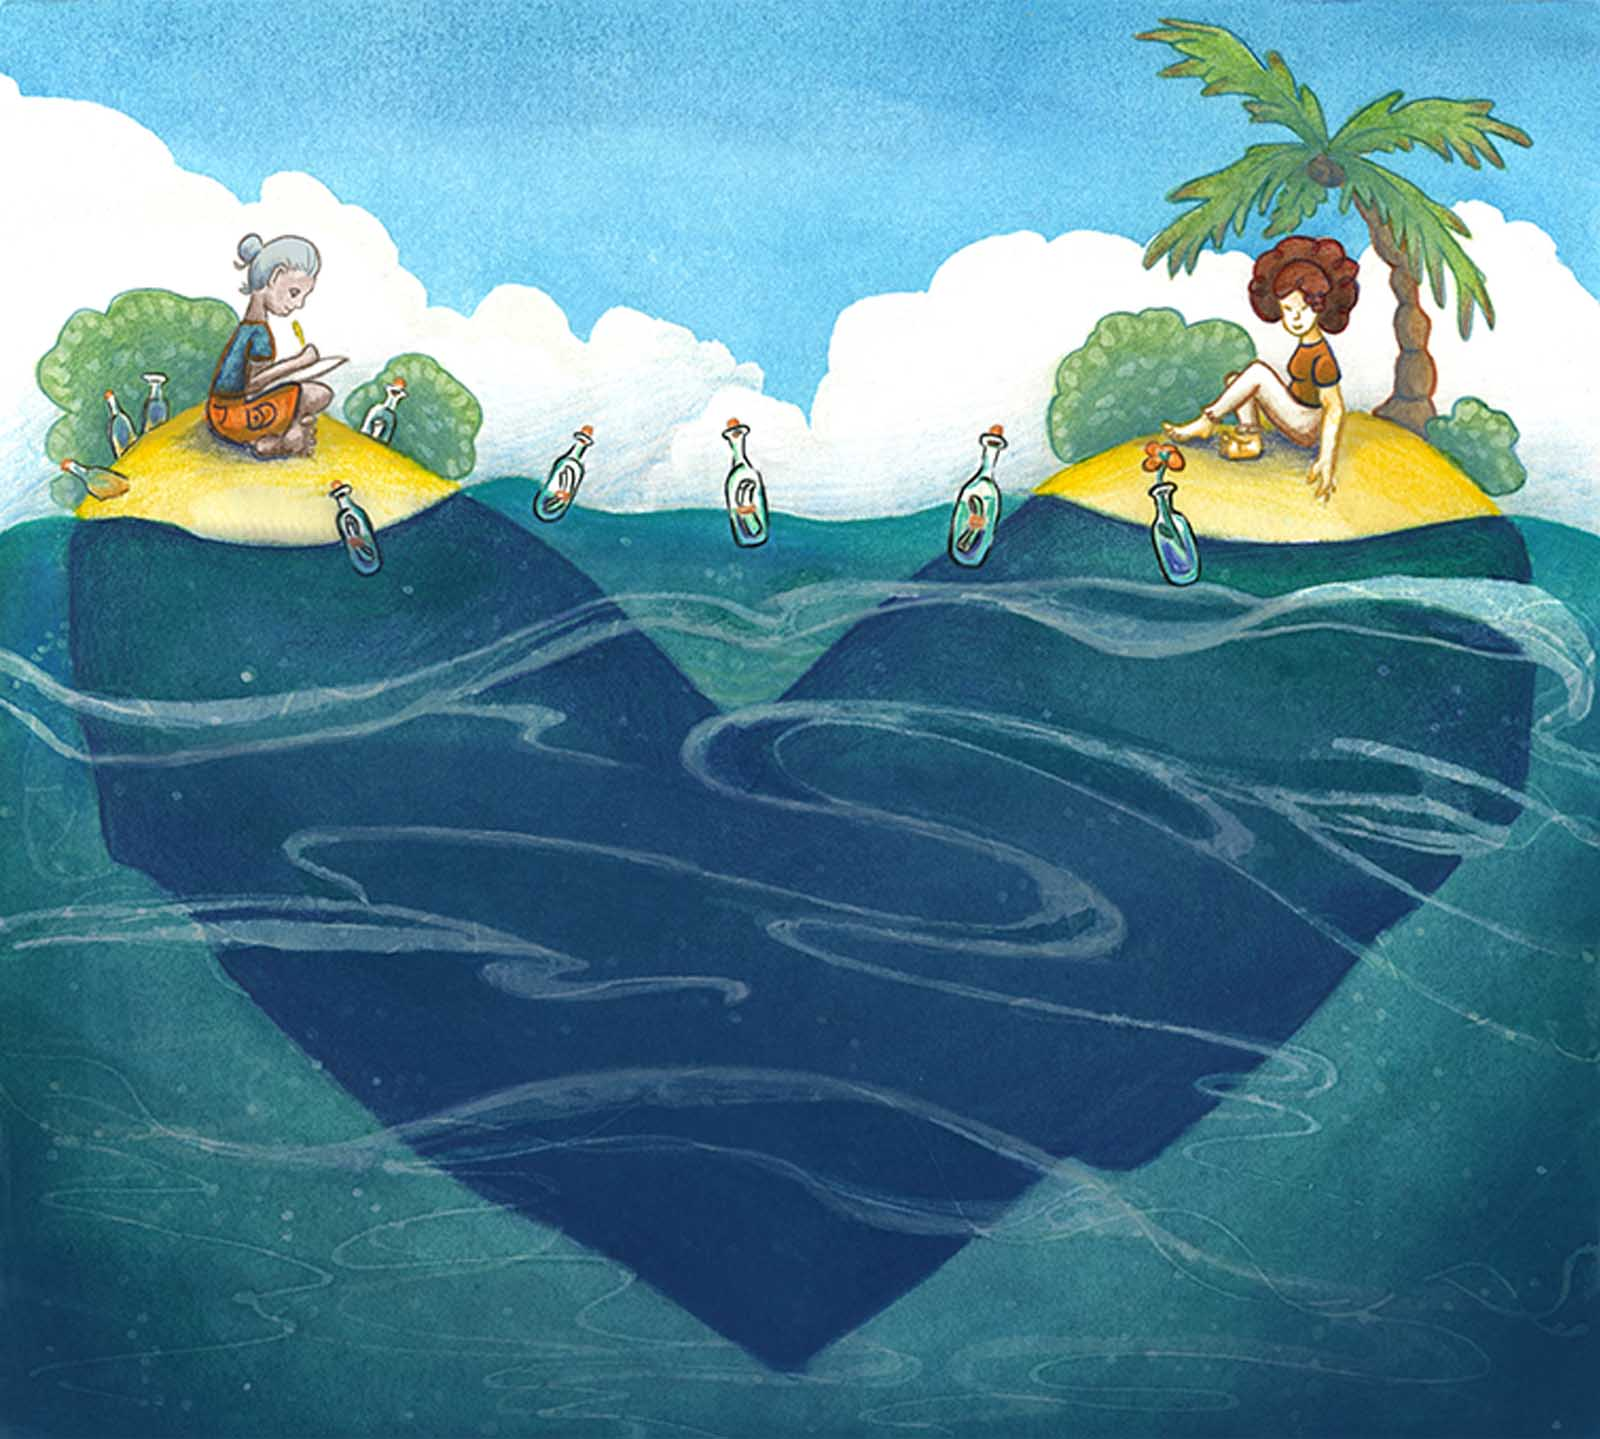 Illustration by Geo Gregas